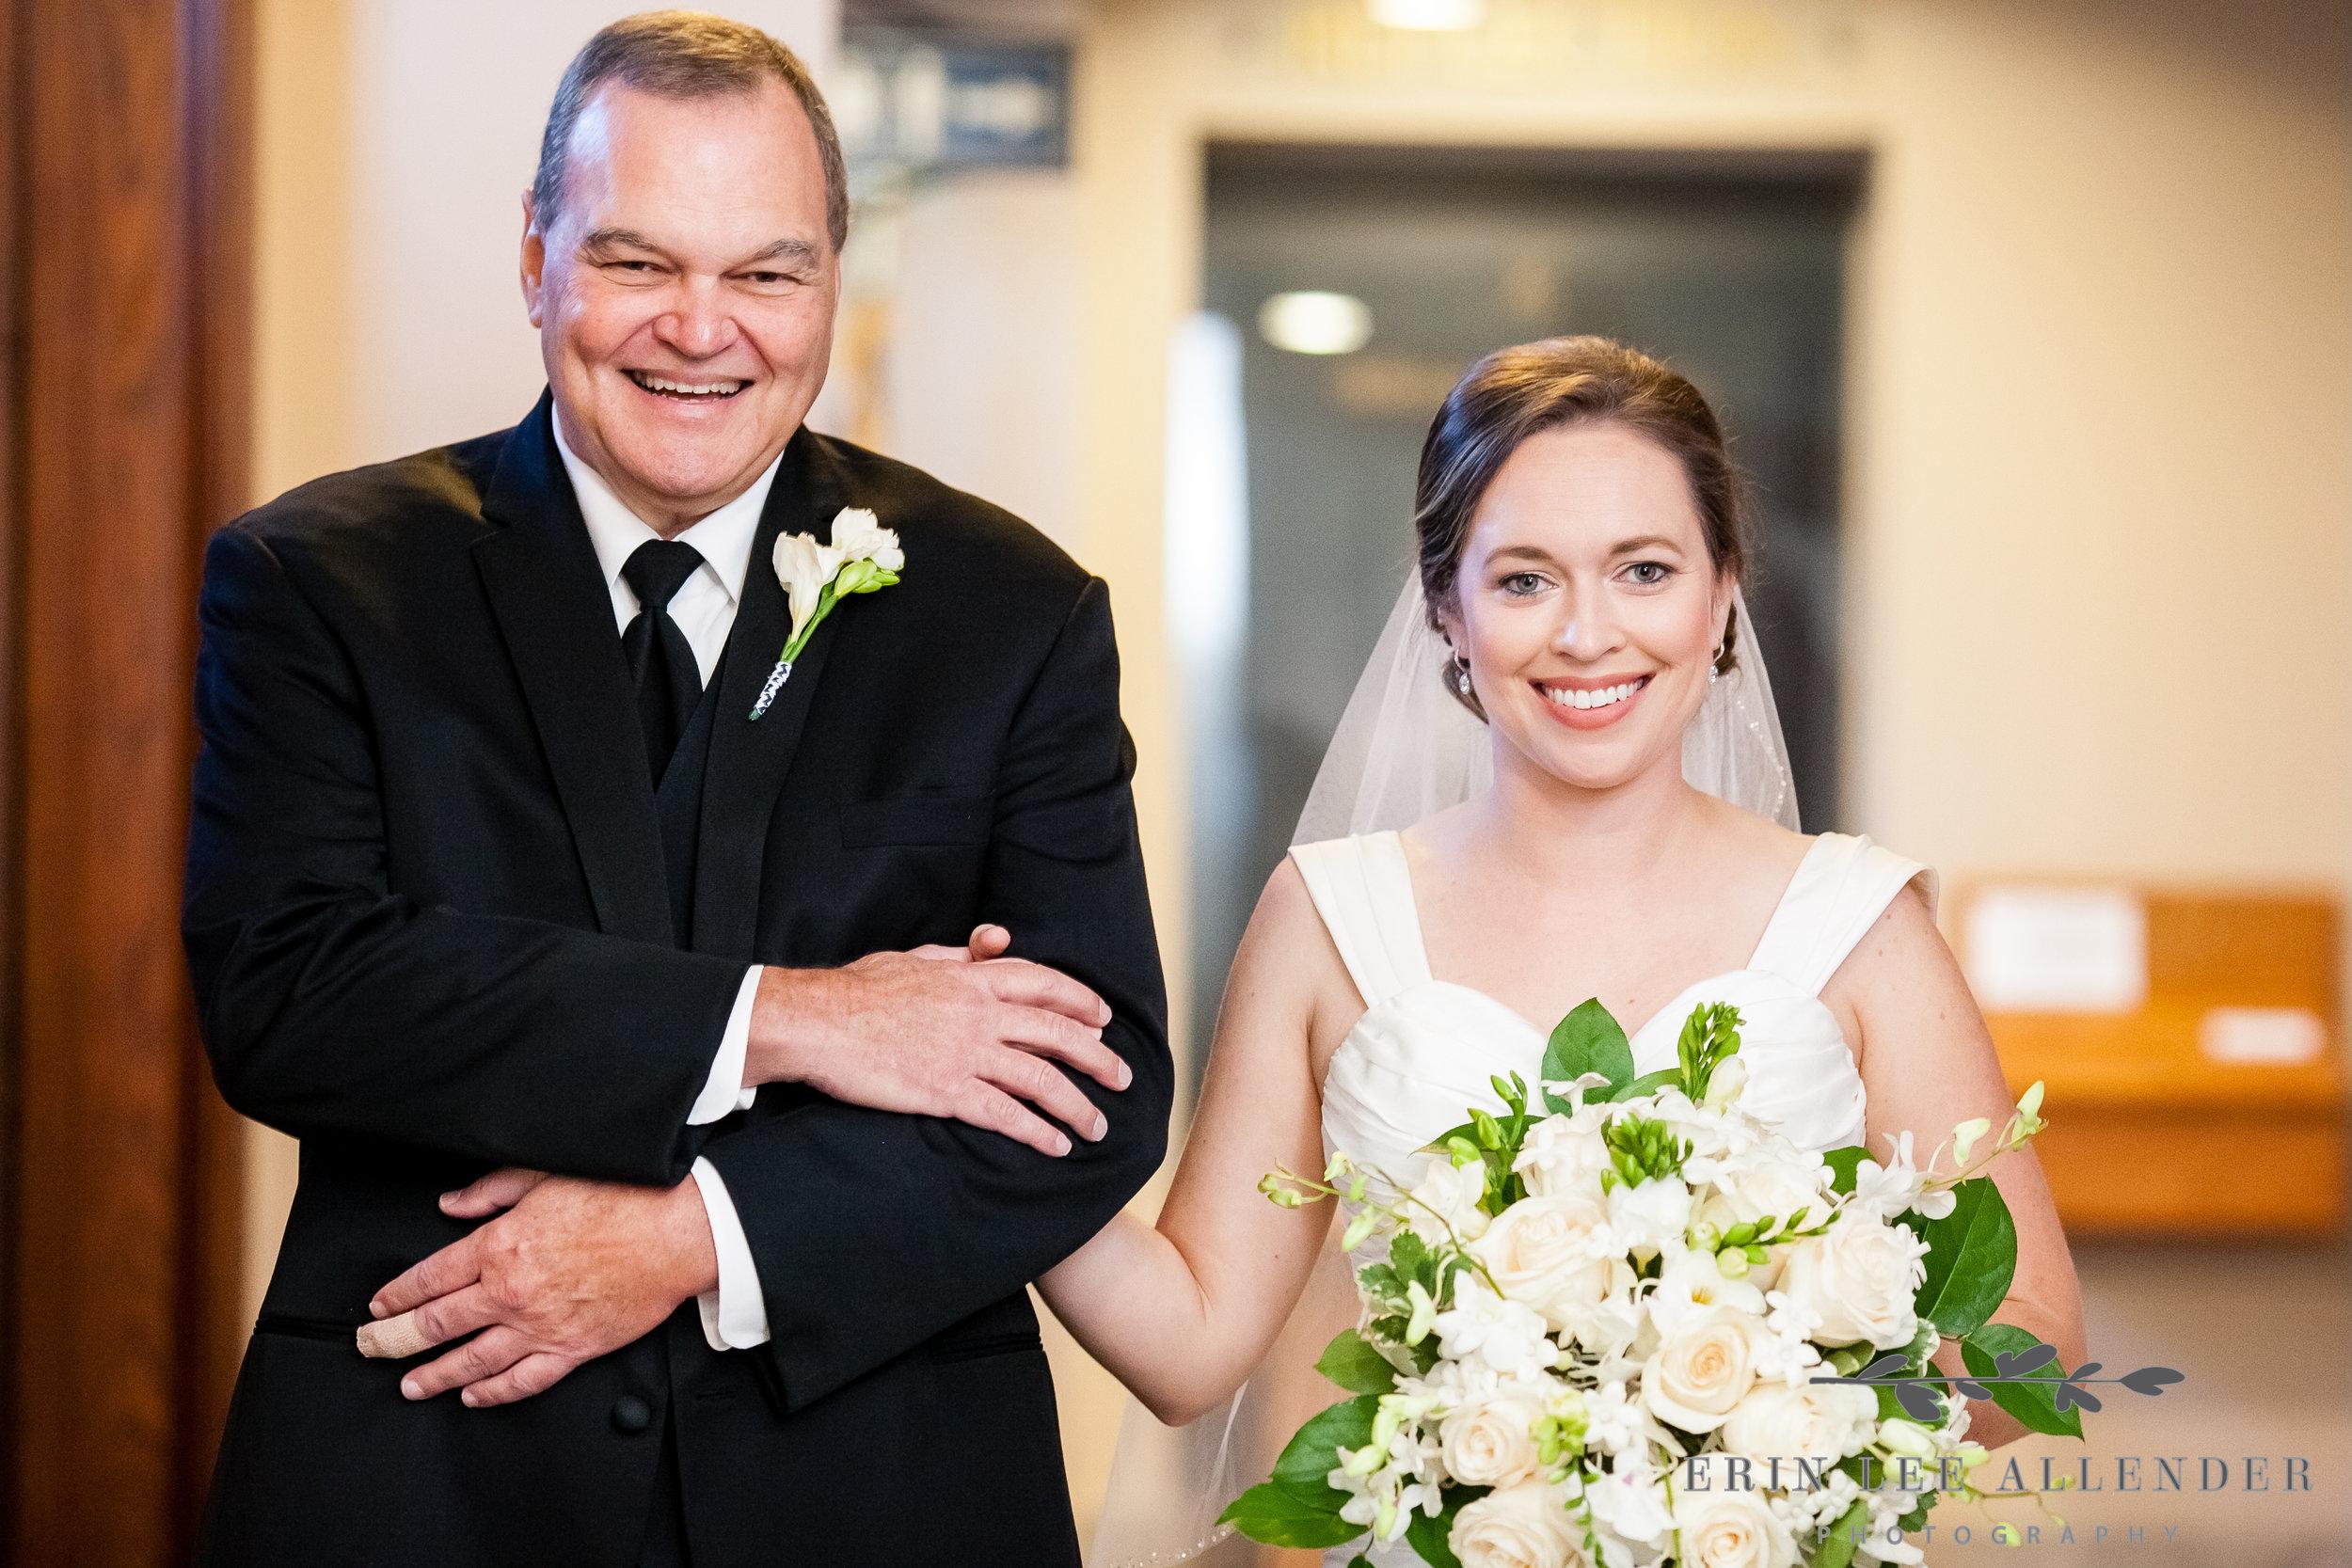 Dad_Gets_Ready_To_Walk_Bride_Down_Aisle